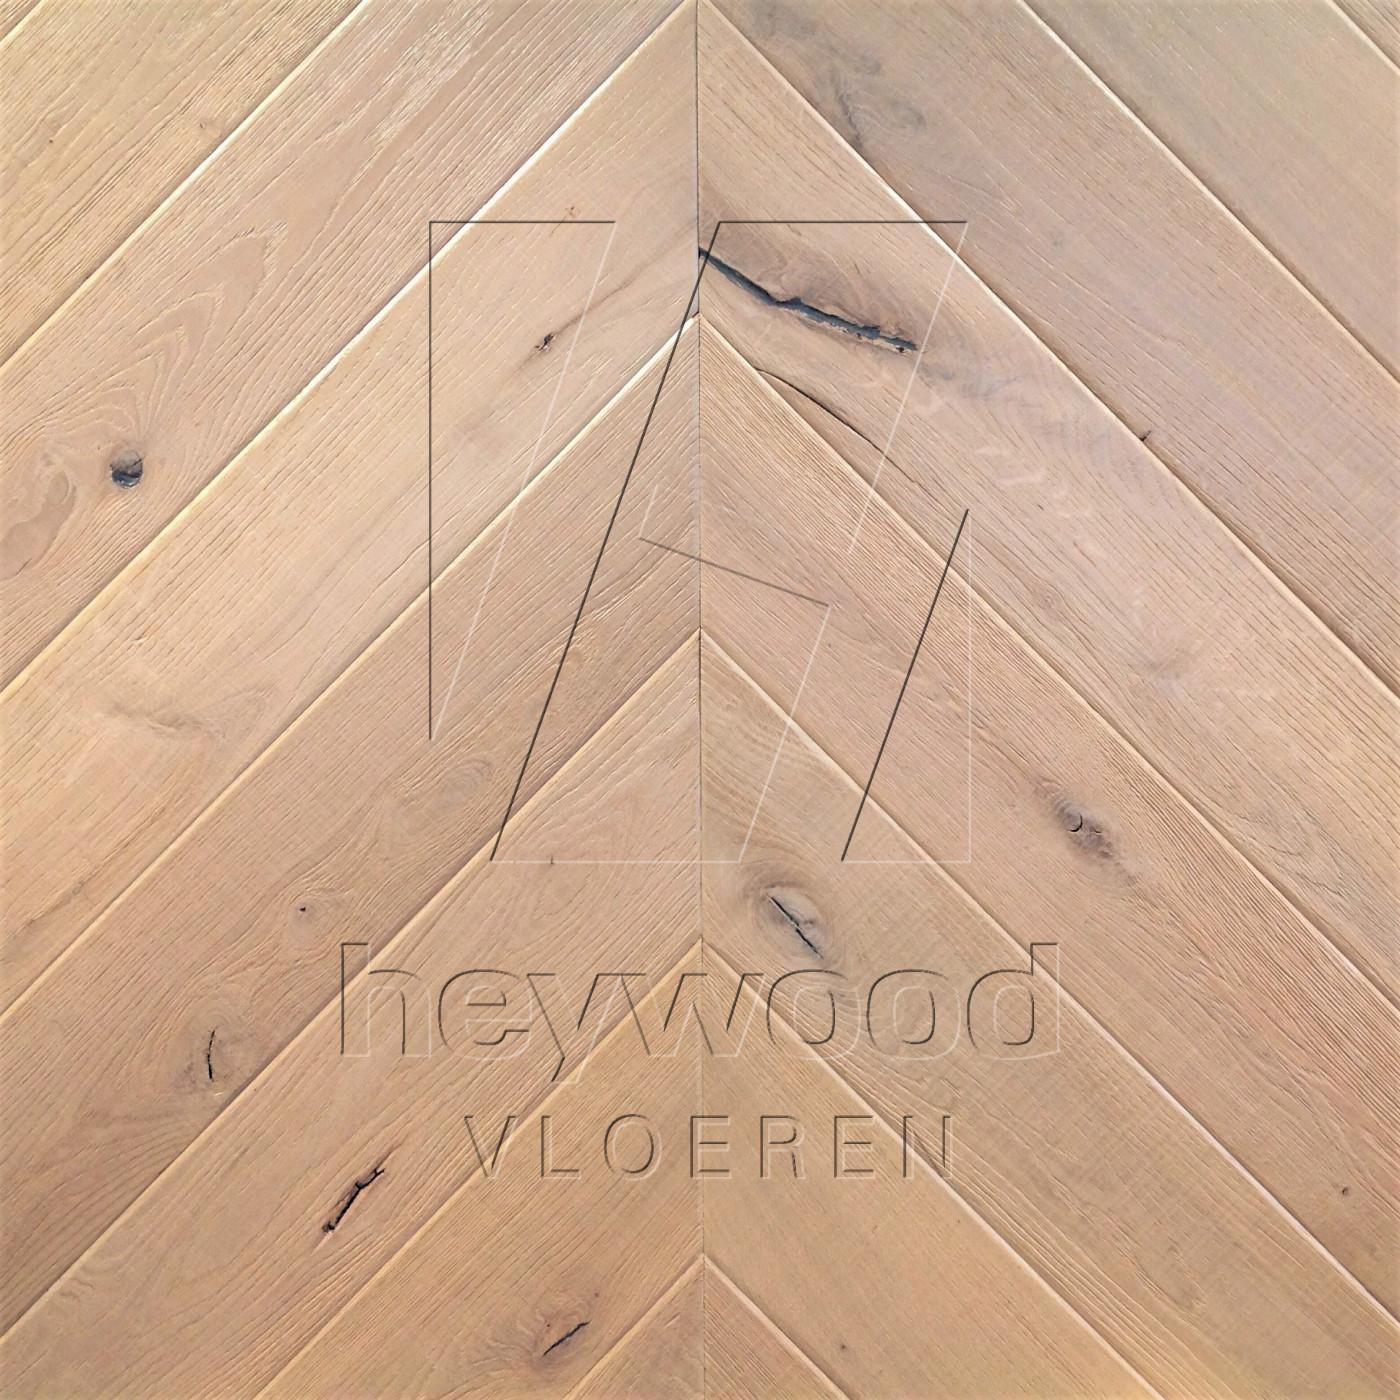 Knotting Hill Chevron 'Virgin' in Chevron of Pattern & Panel Floors